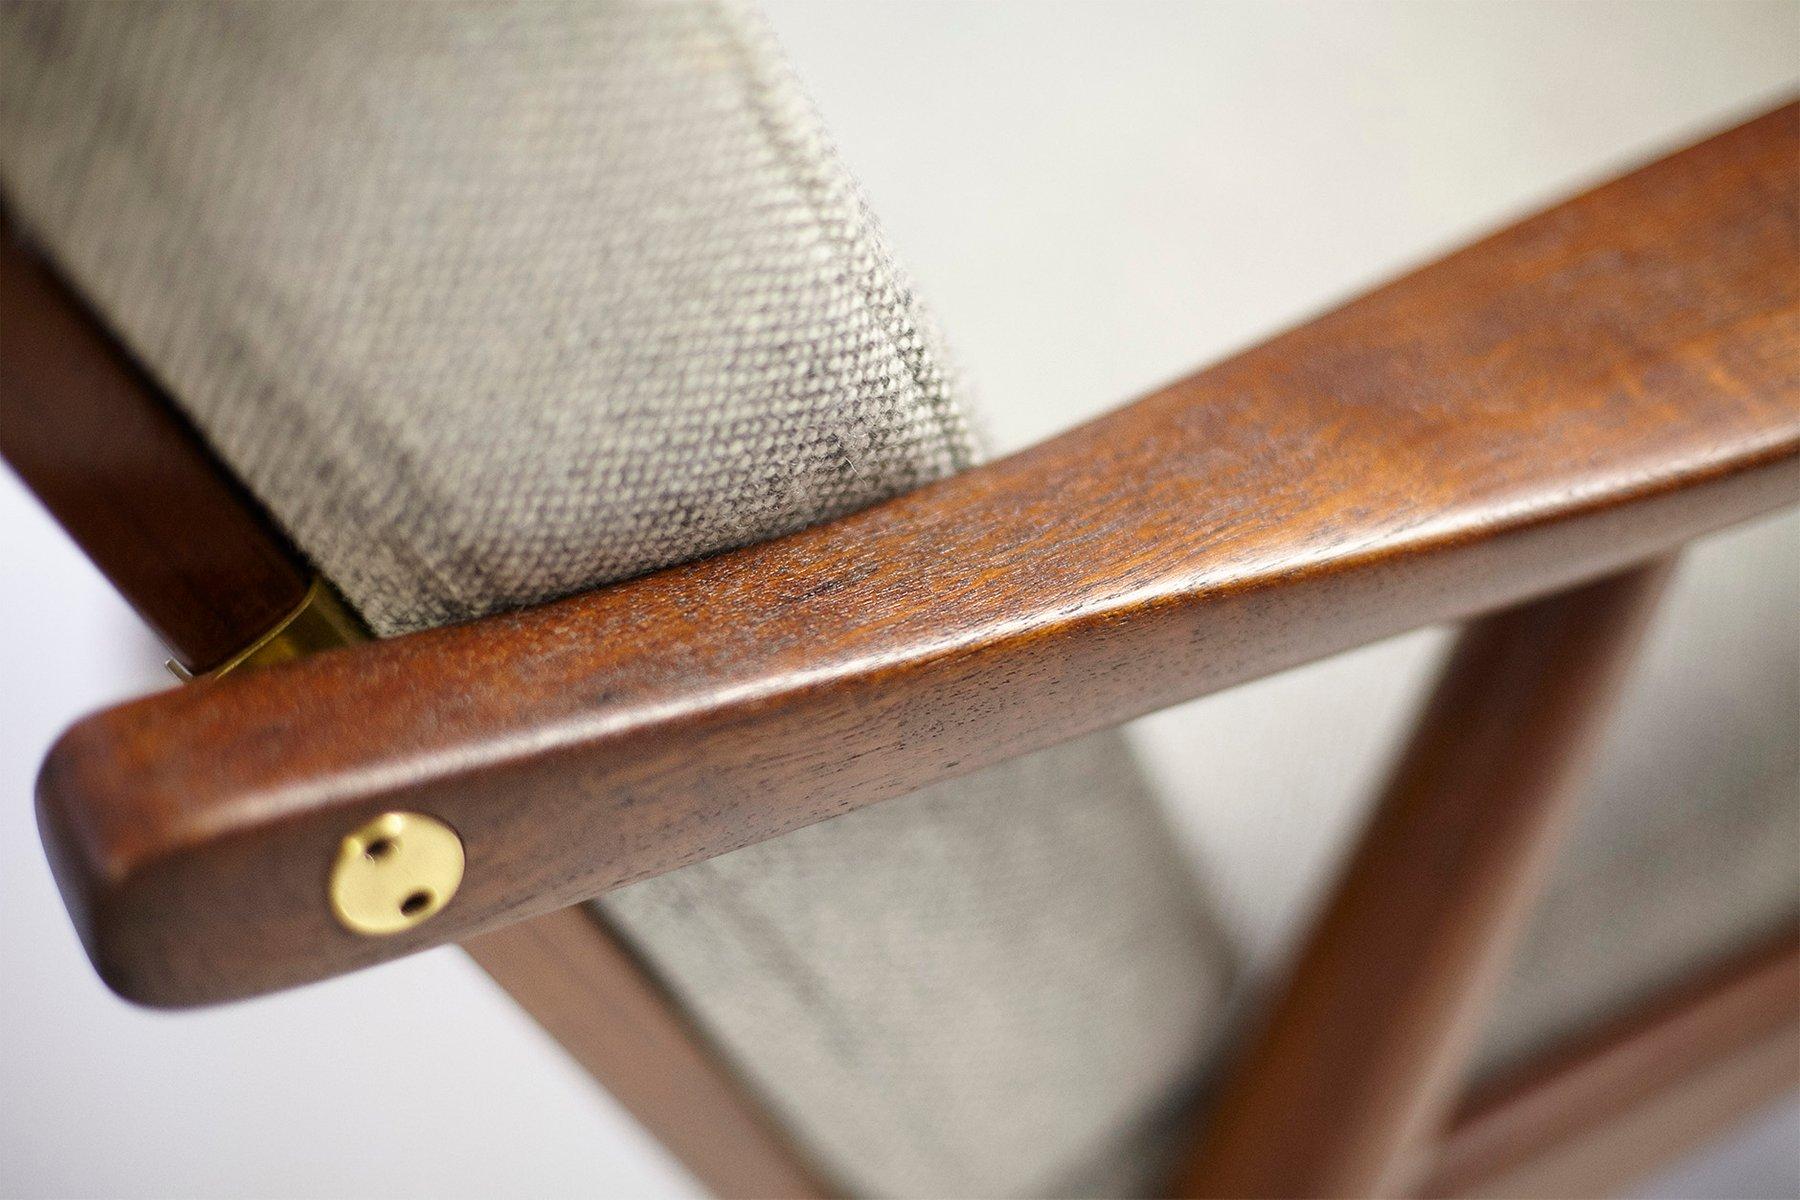 GE 270 Teak Lounge Chair by Hans J Wegner 1956 for sale at Pamono